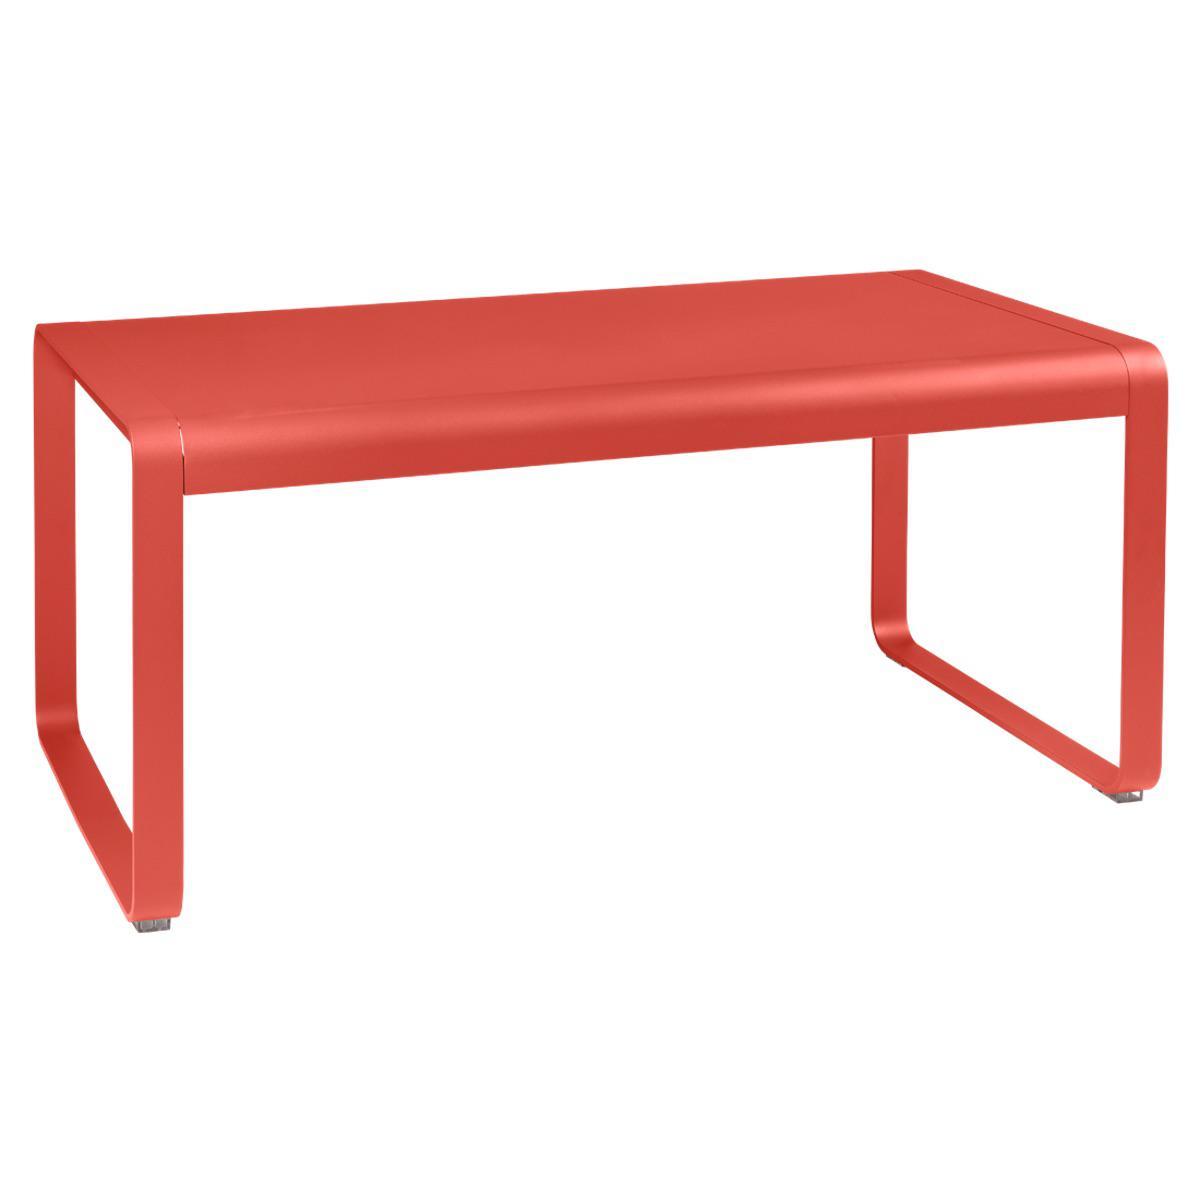 Table de jardin mi-hauteur 80x140cm BELLEVIE Fermob capucine